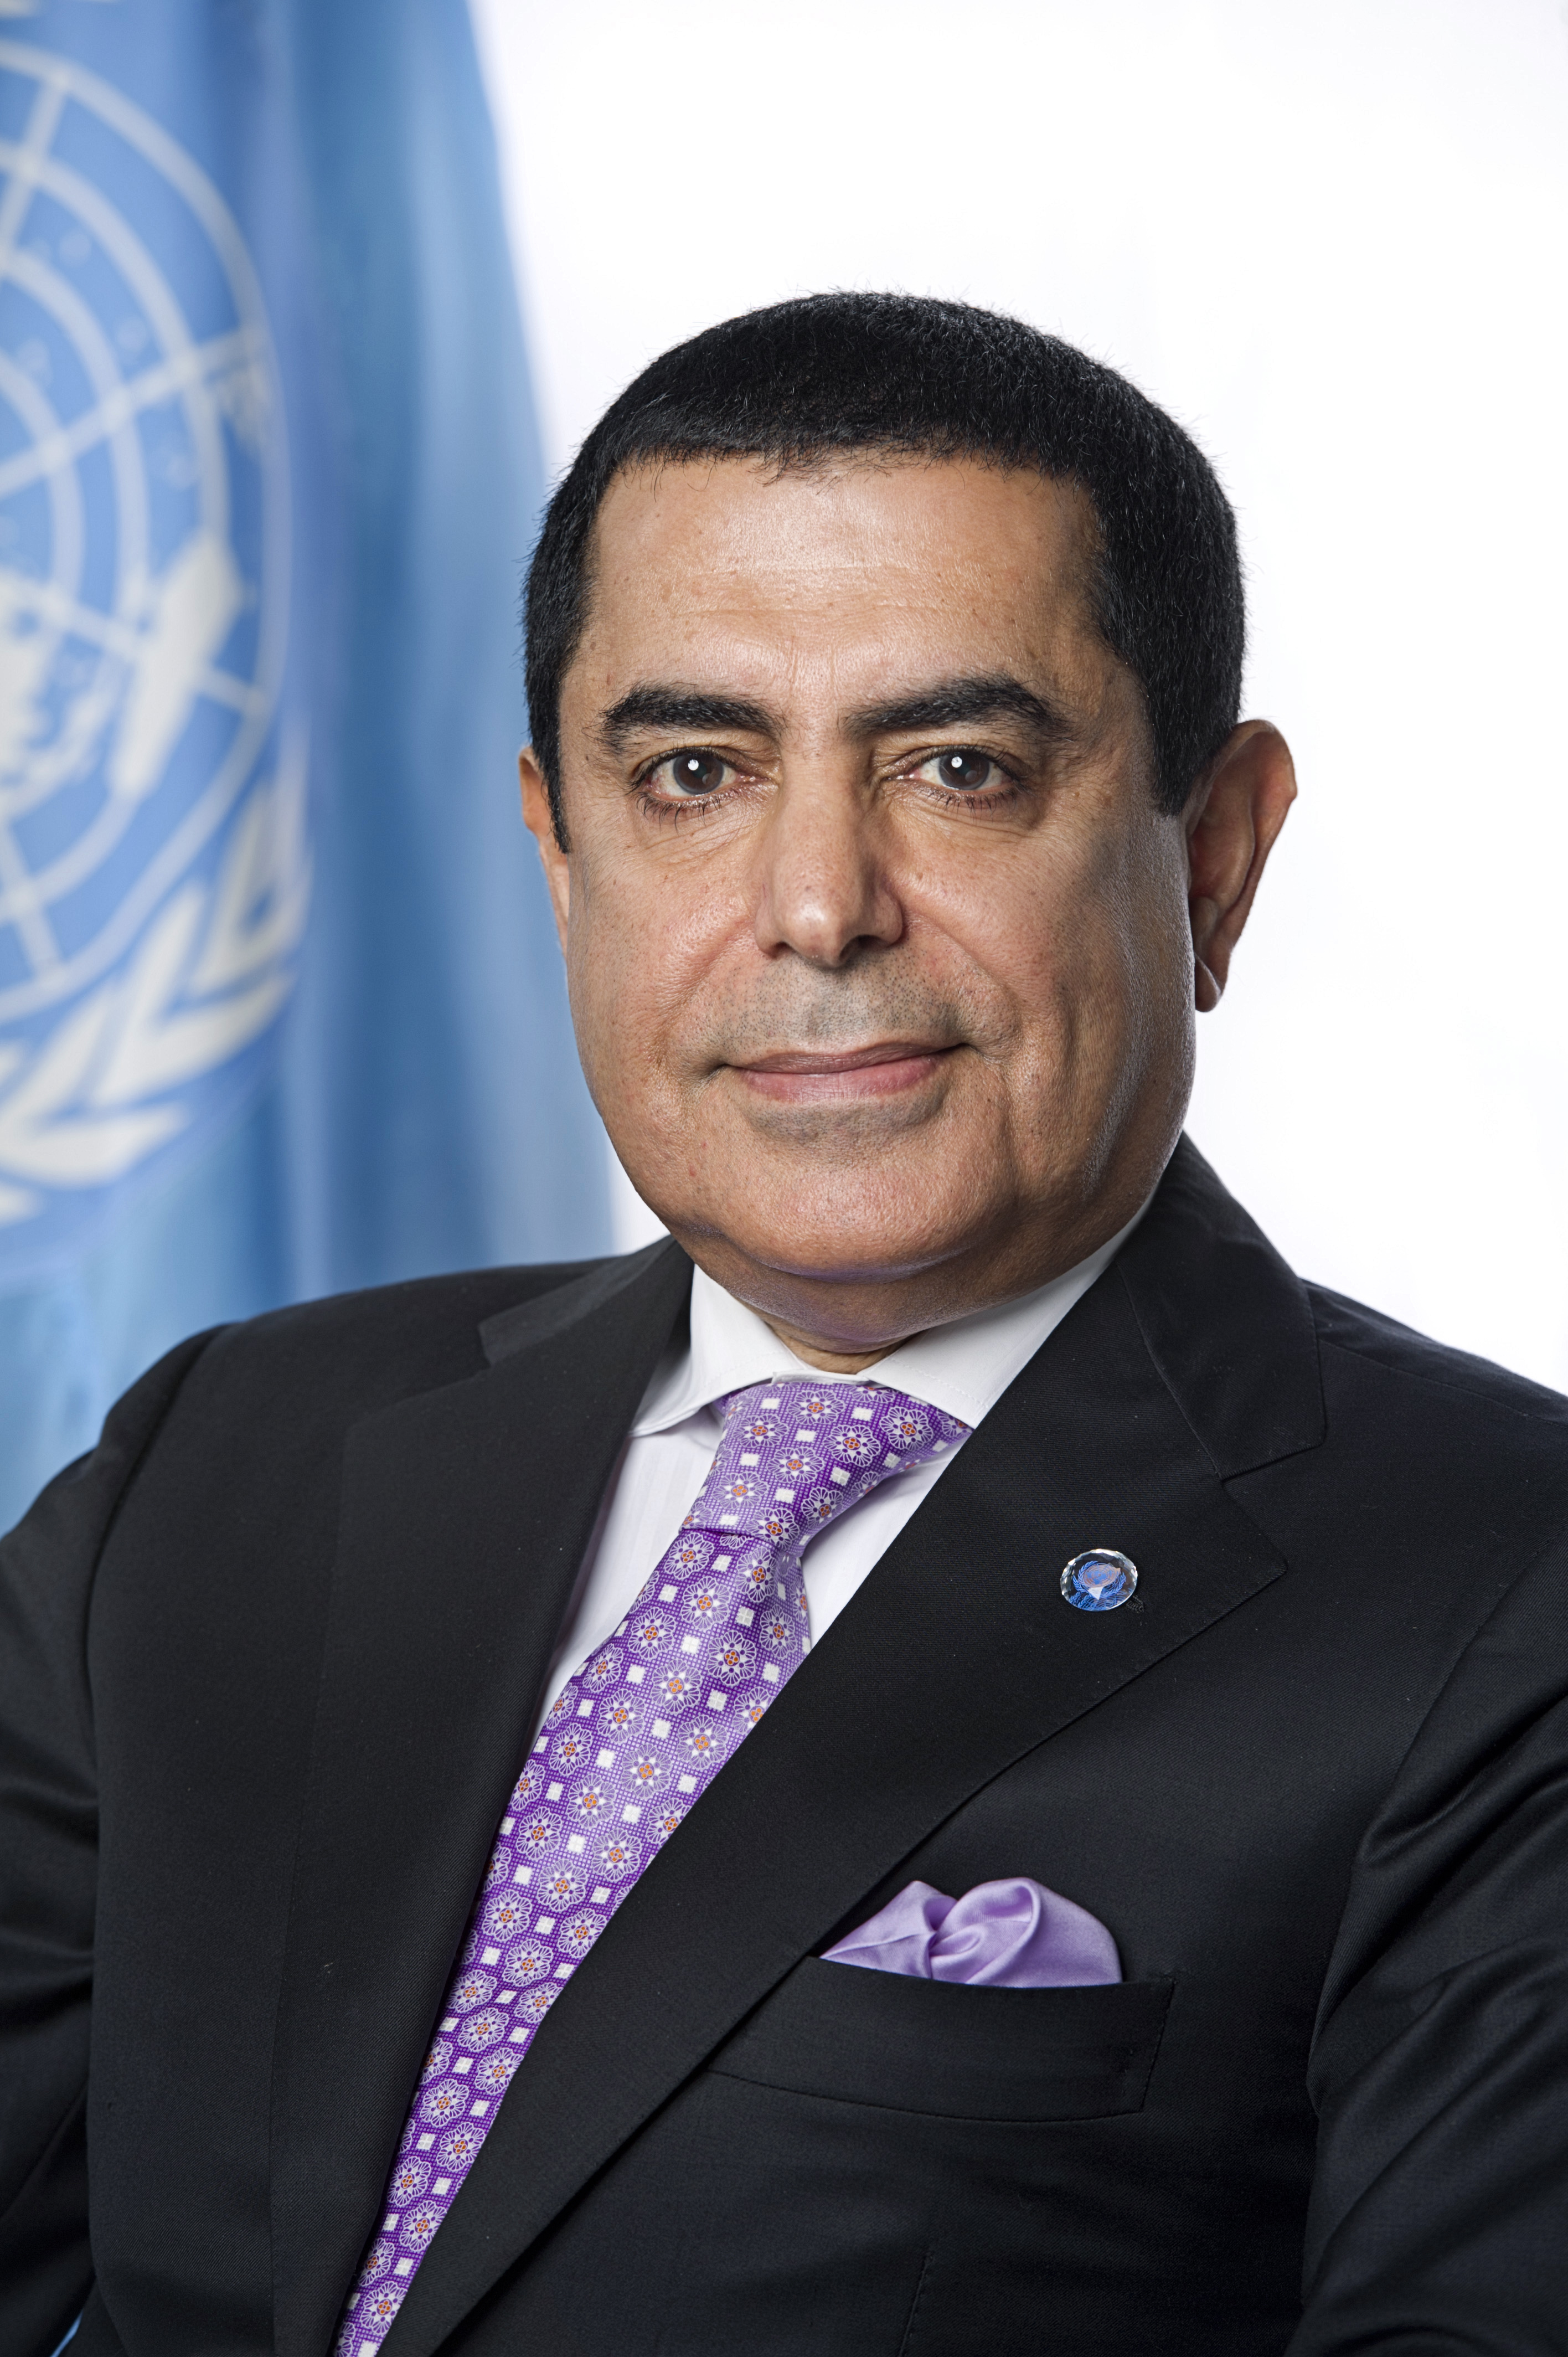 Al-Nasser Nassir Abdulaziz